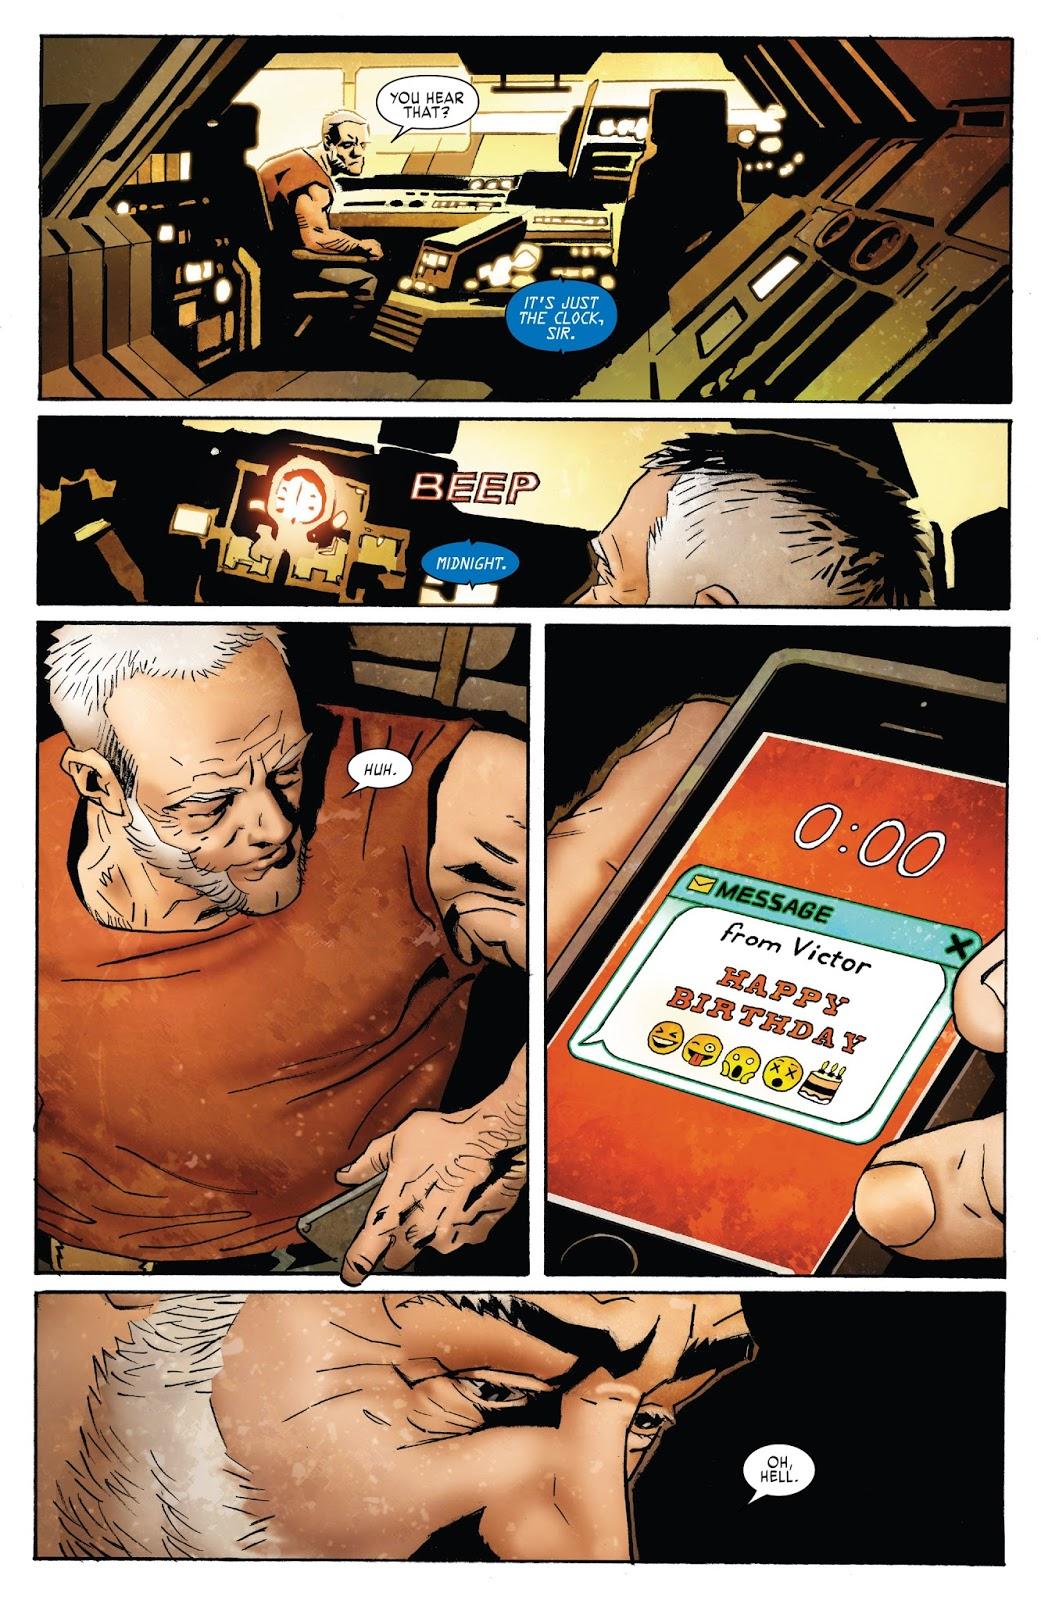 wolverine birthday Wolverine And Sabretooth's Birthday Tradition | Comicnewbies wolverine birthday